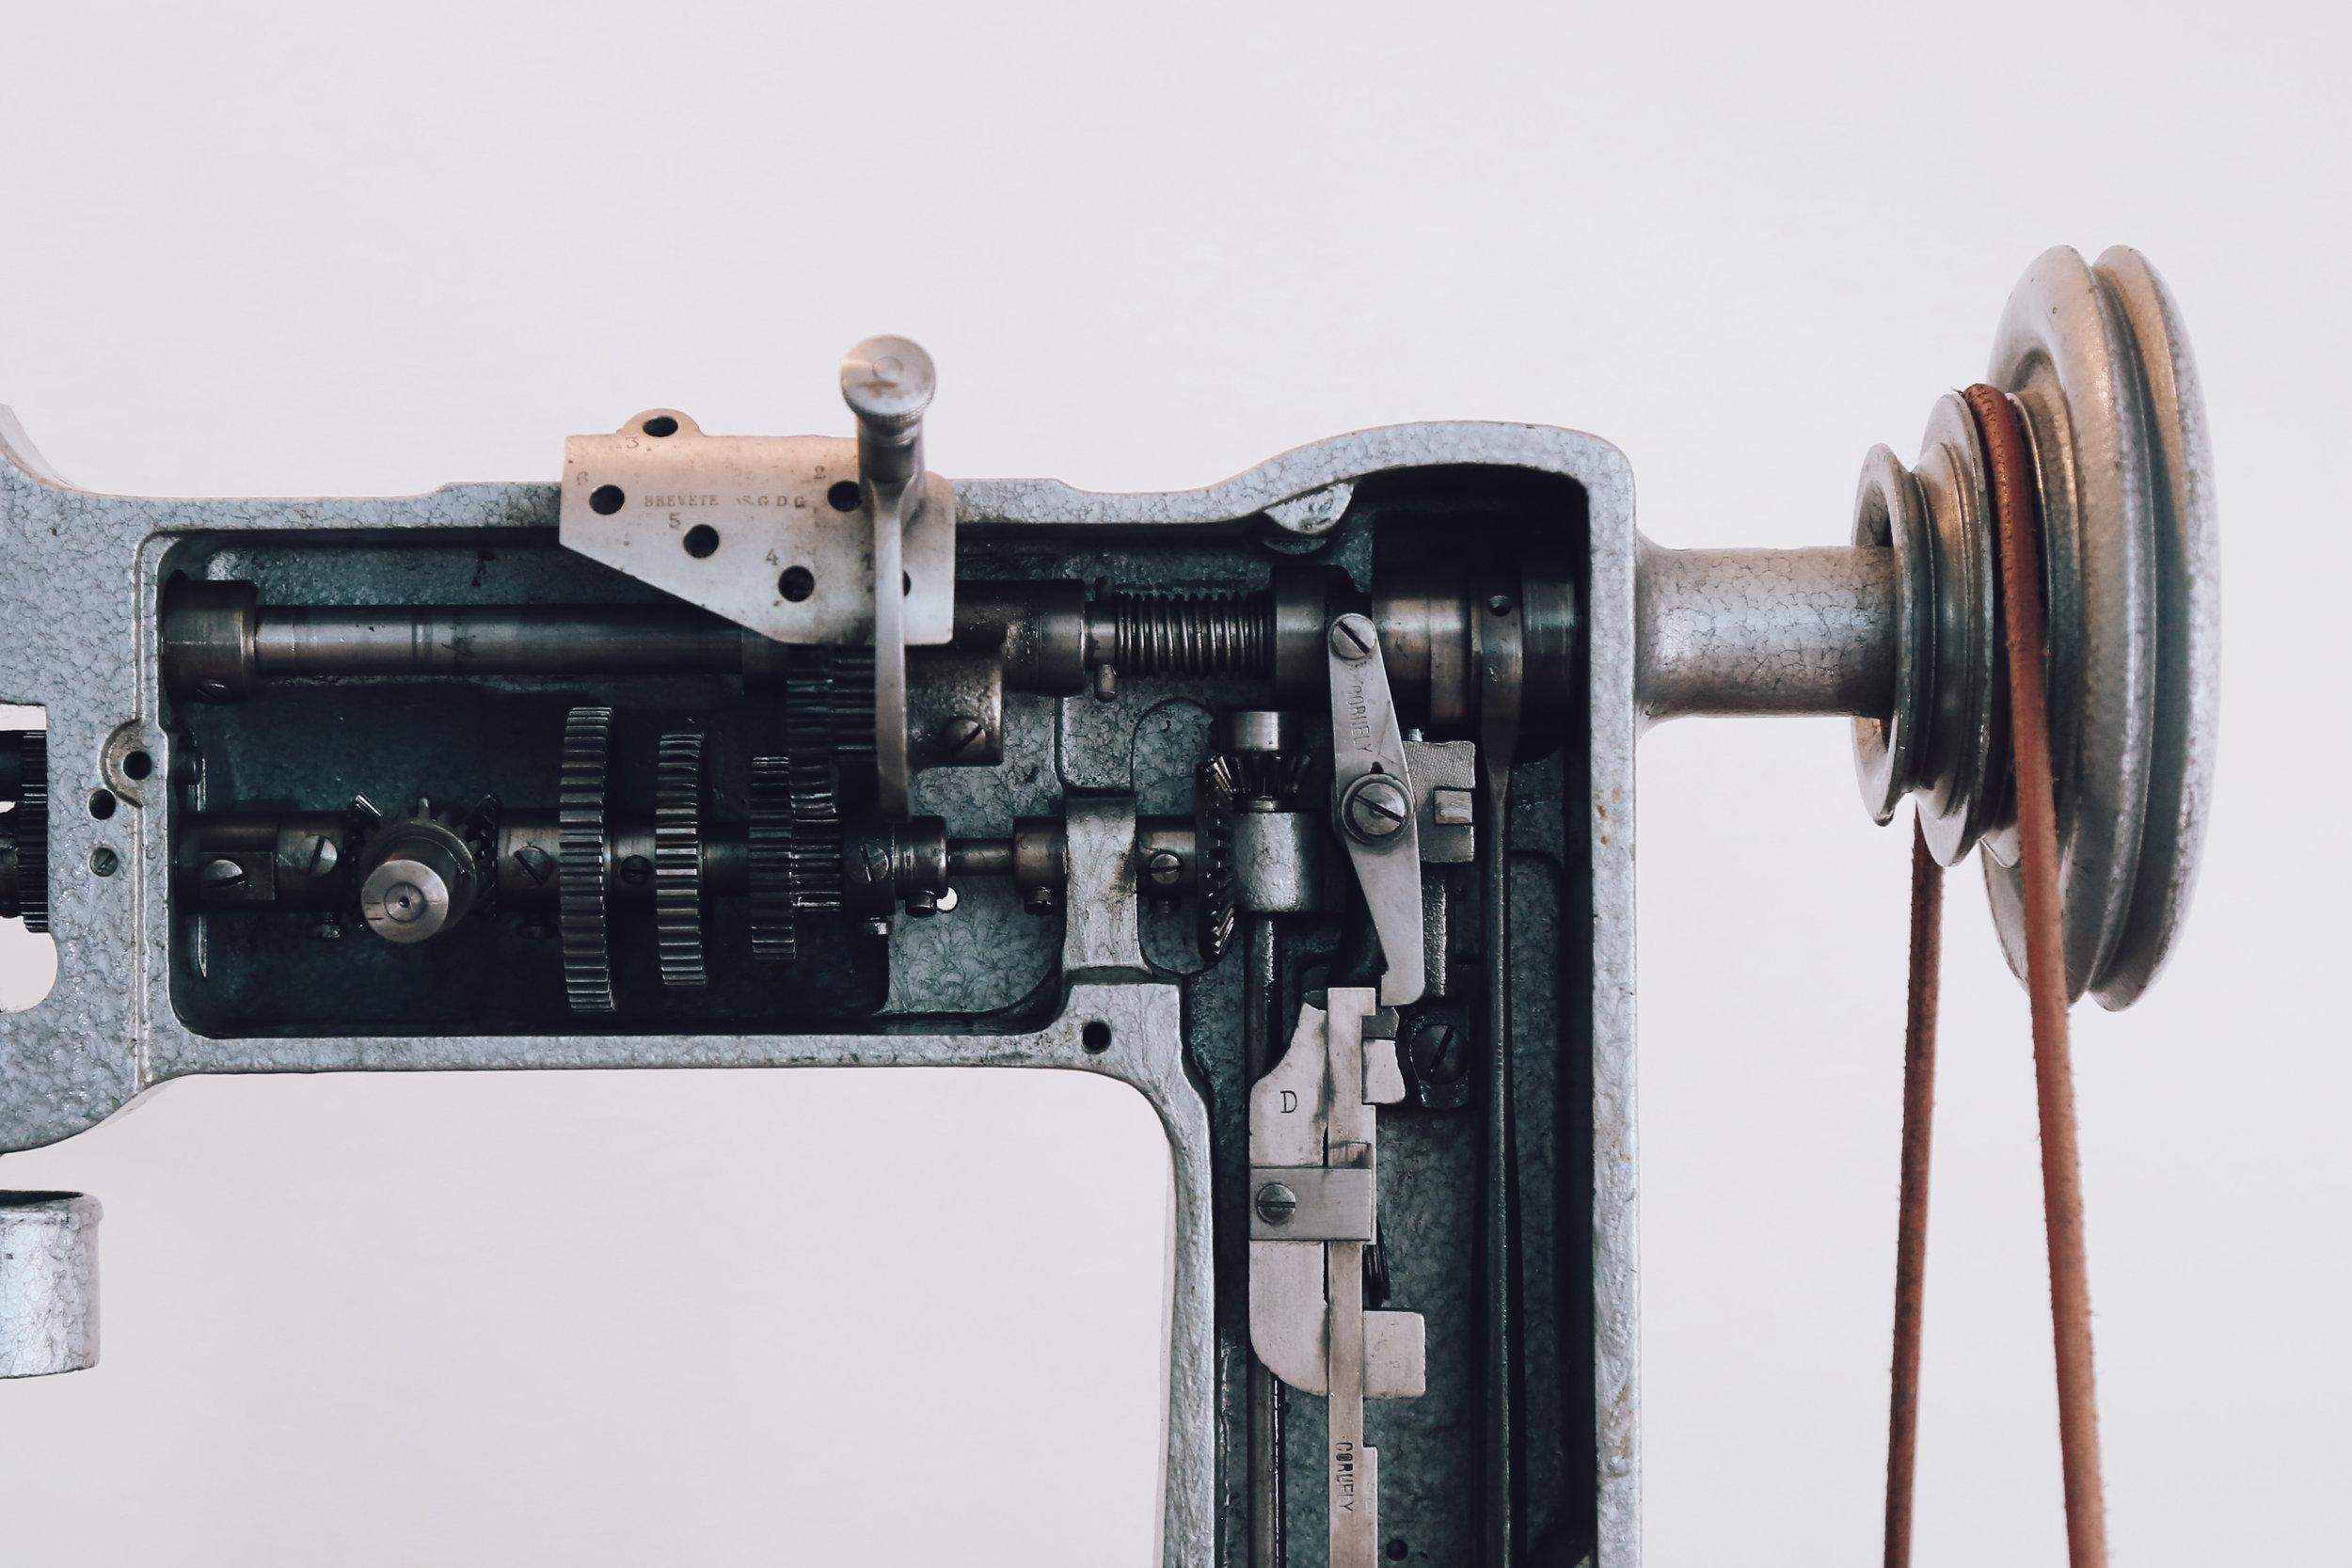 Handcrank Embroidery Machine Cornely LG Singer 114w103 Saintchains